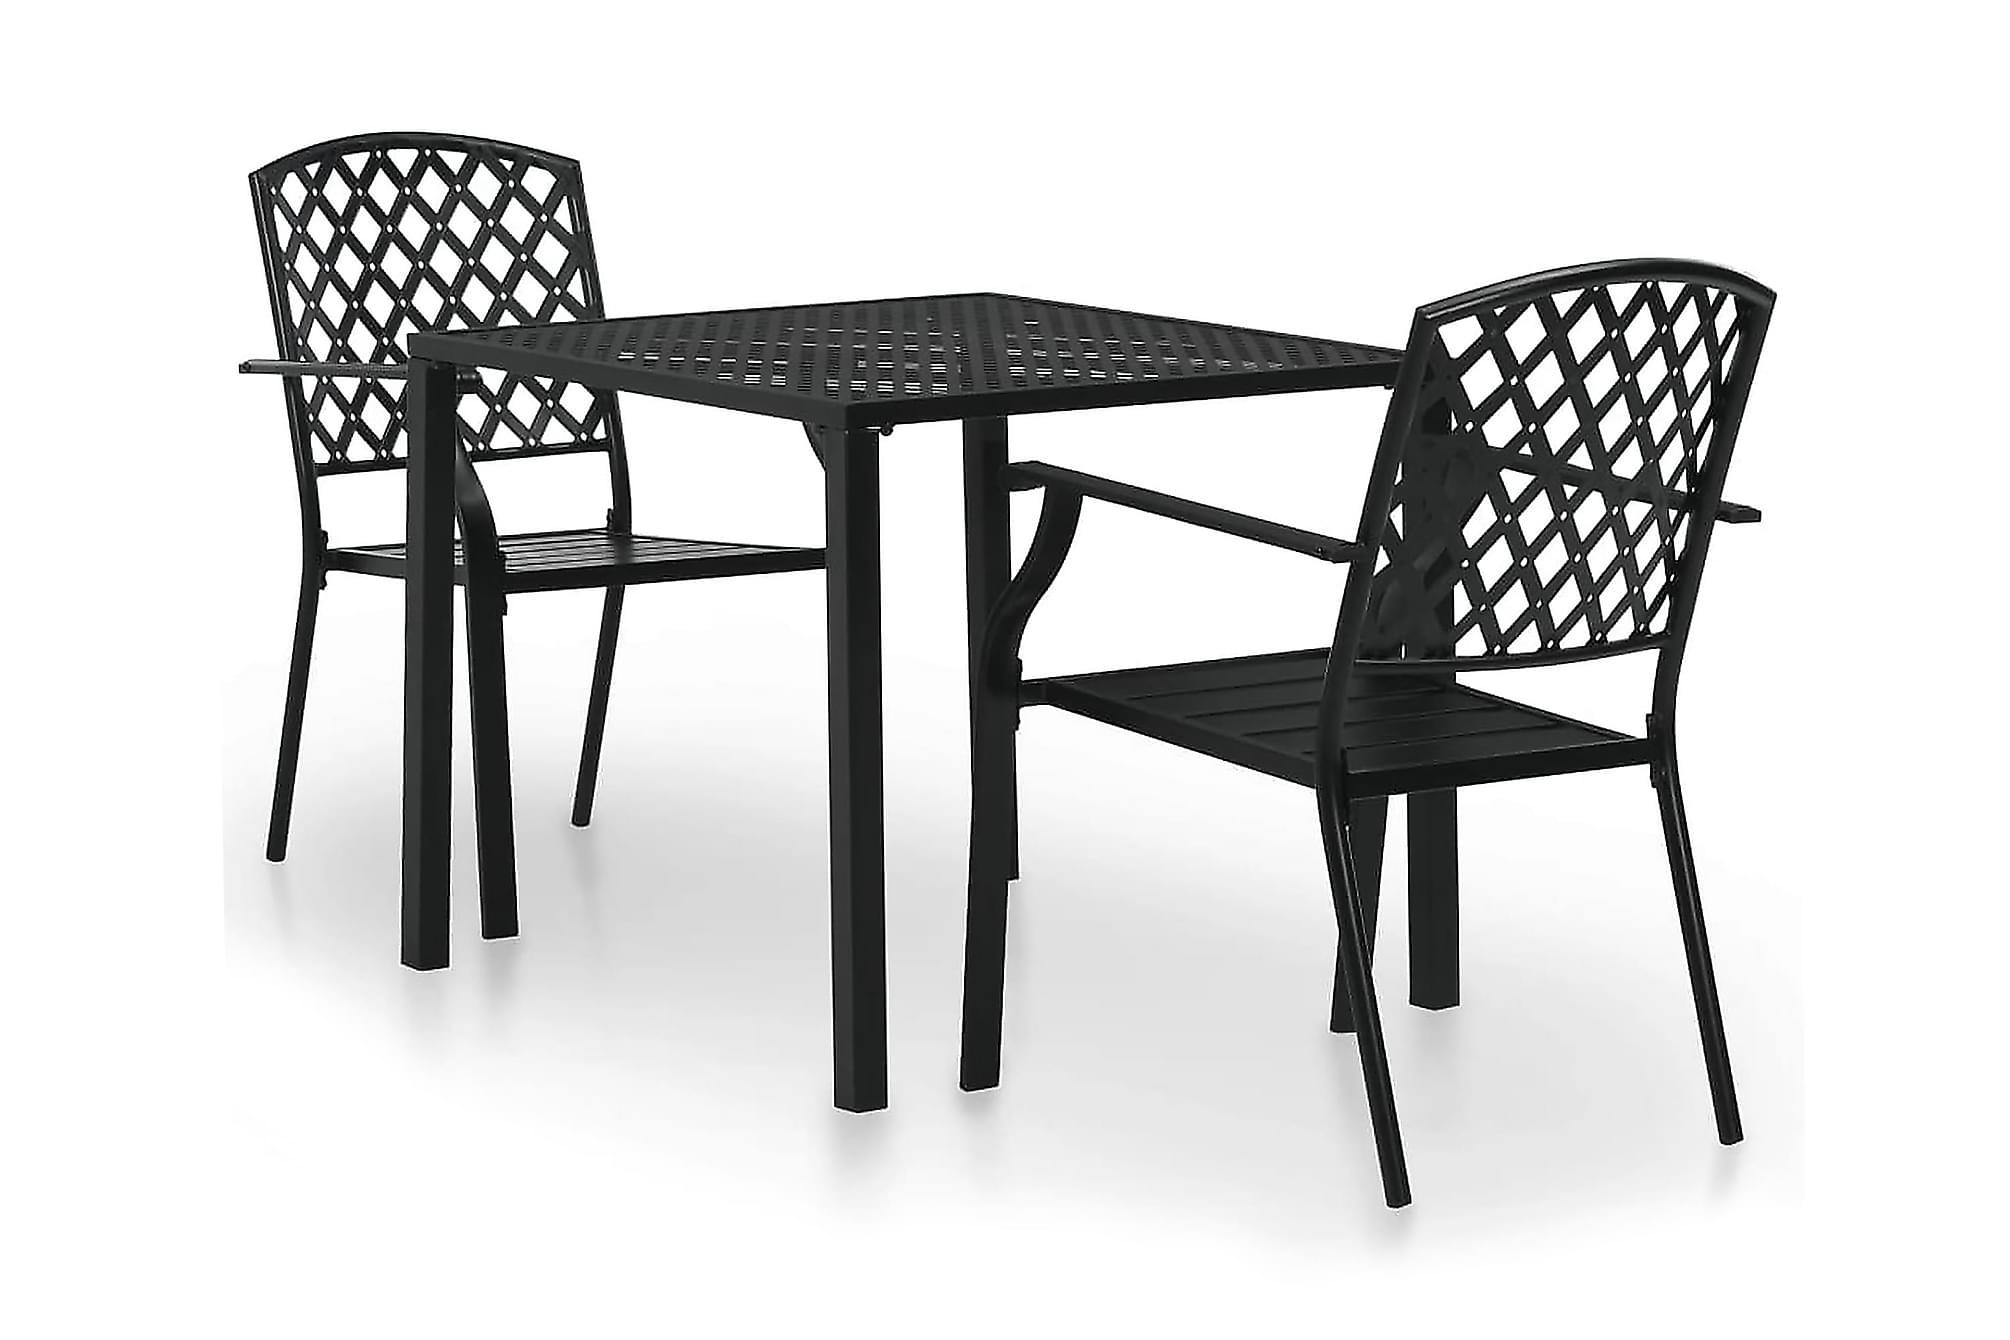 Caféset 3 delar stål svart, Caféset